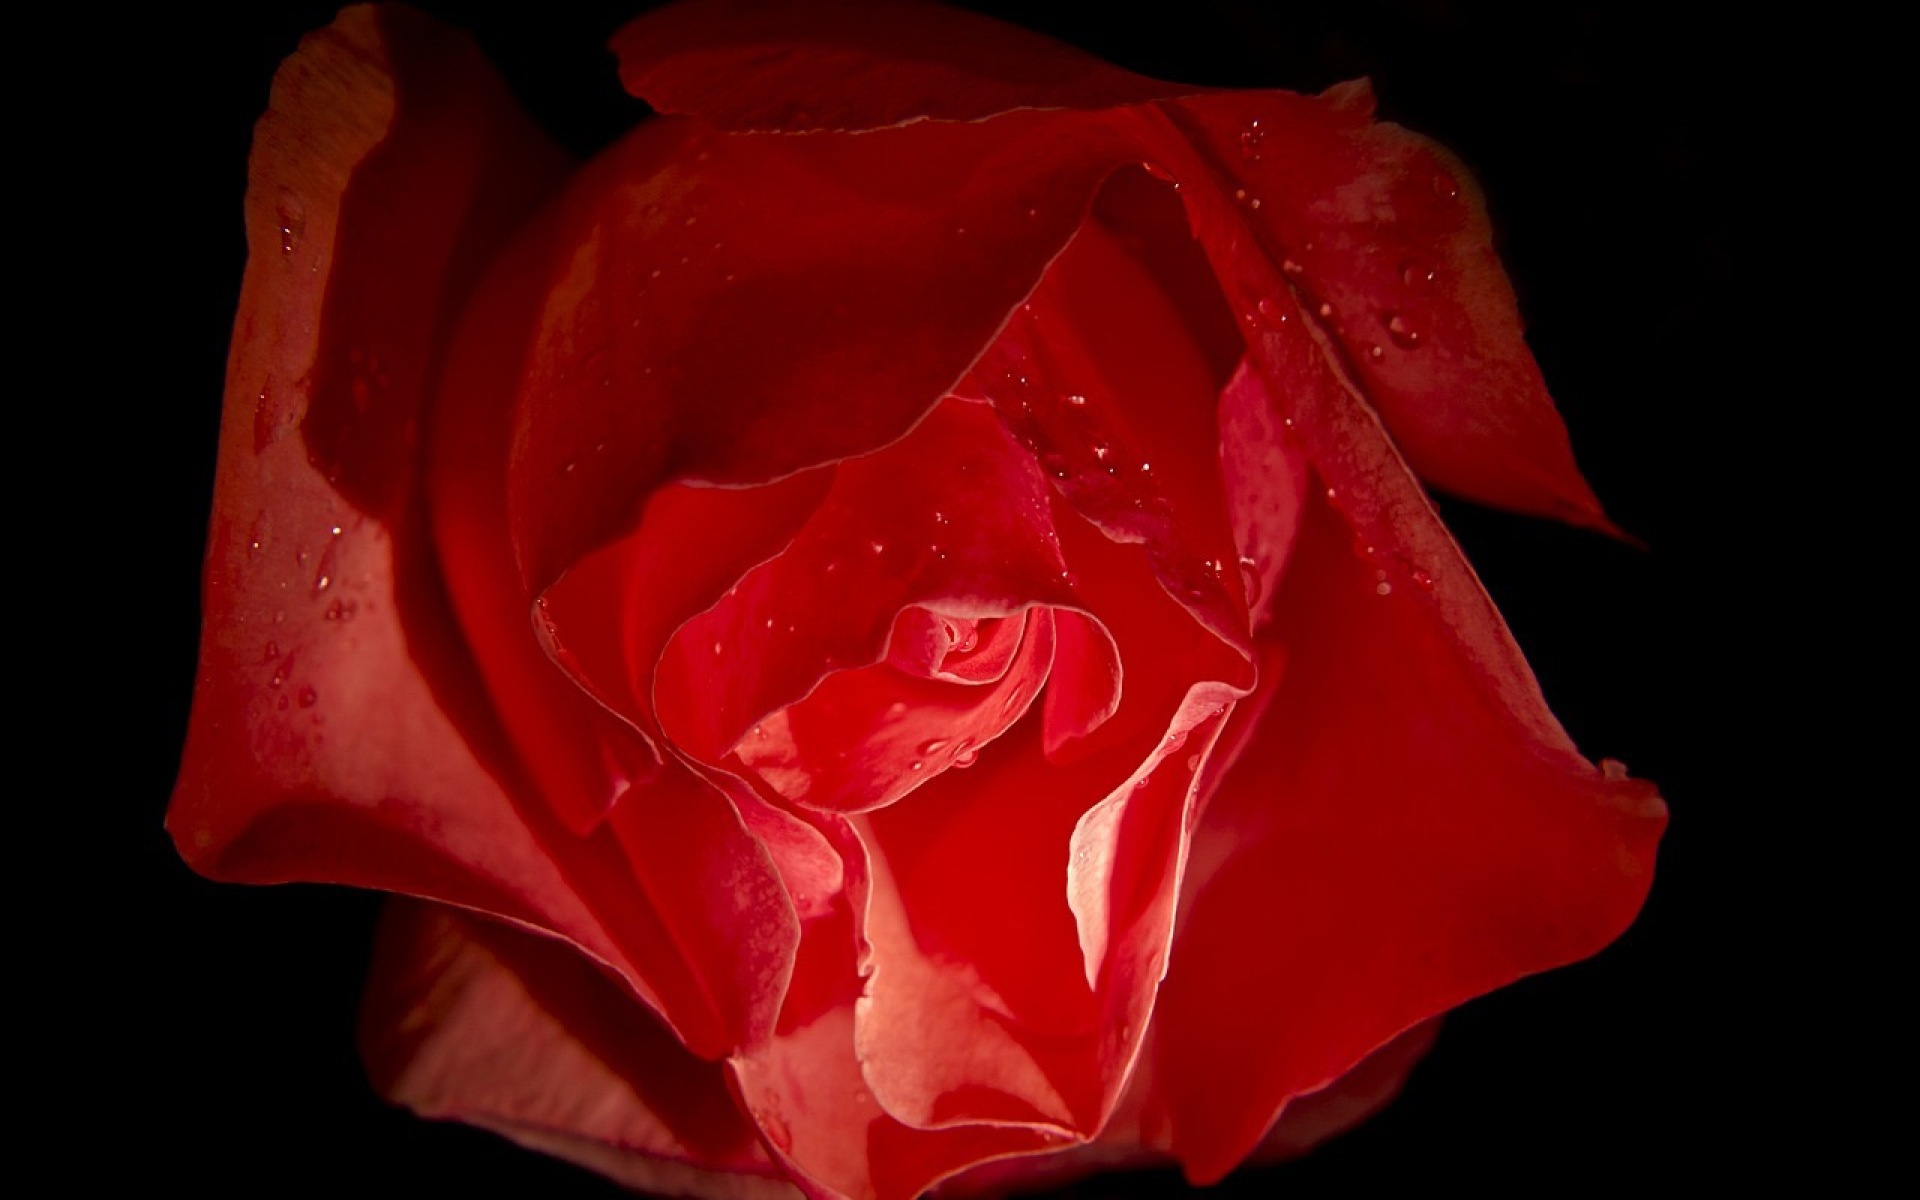 Rosa-3580753_1280